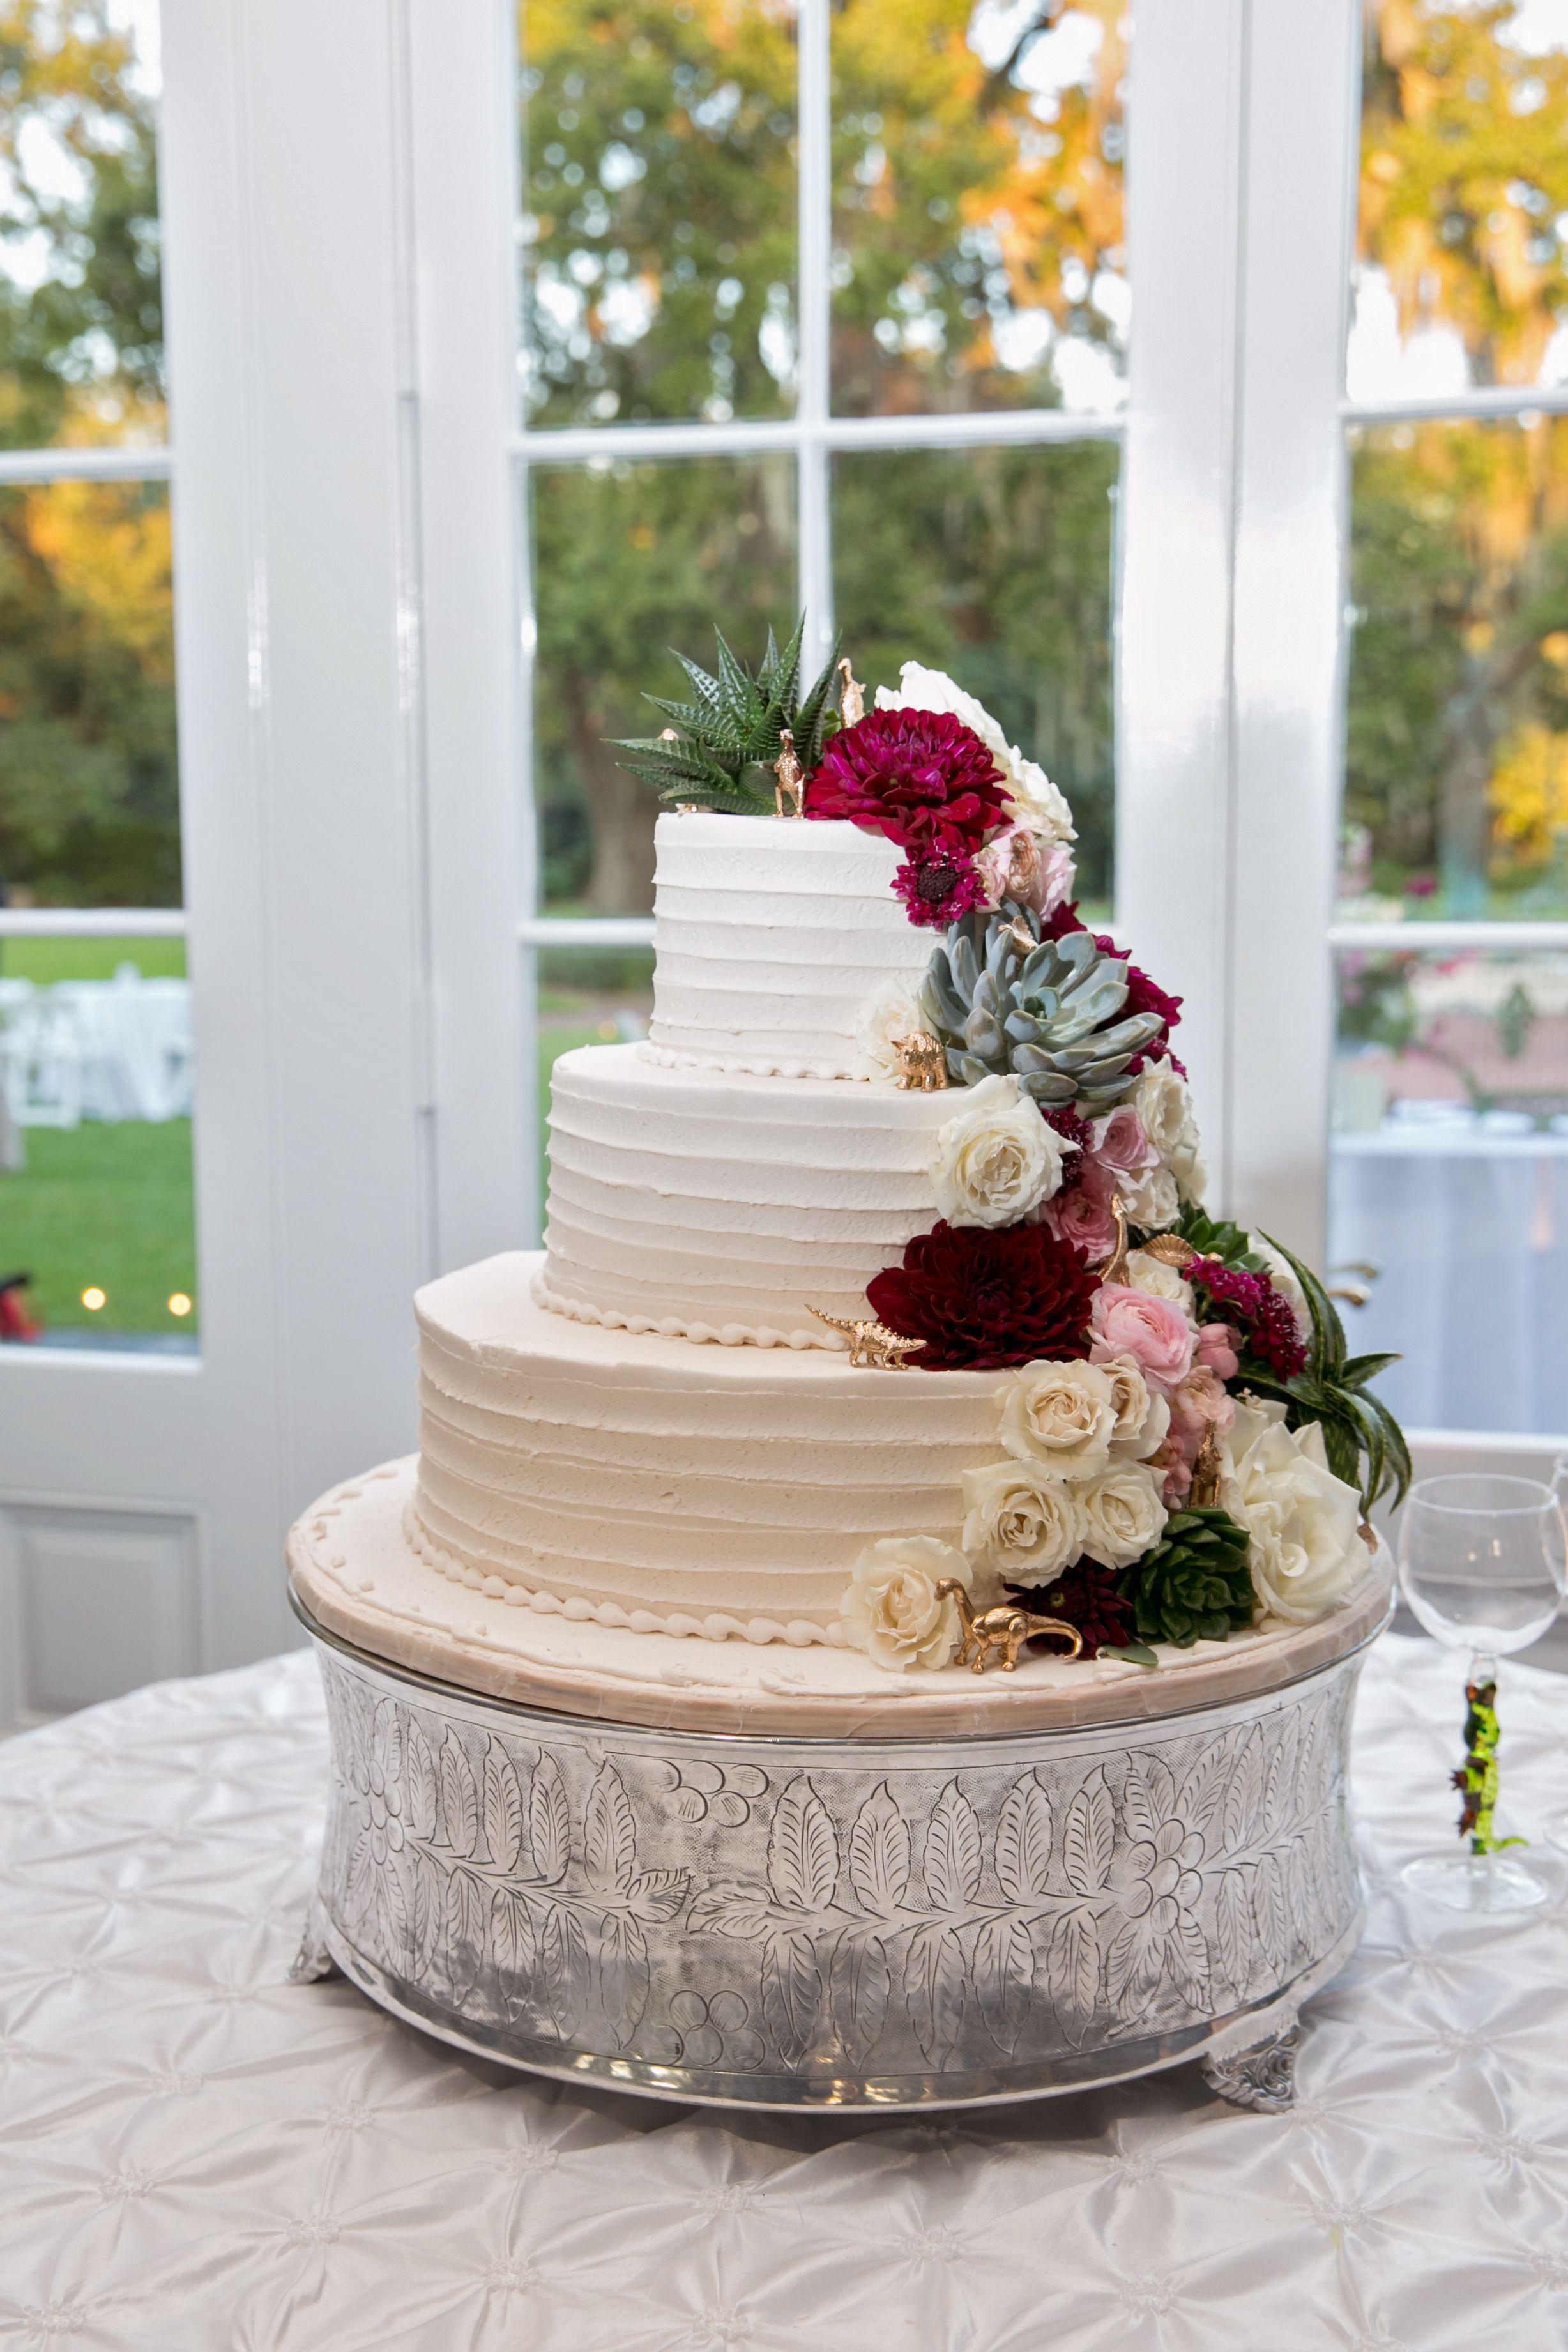 Wedding Cakes Eau Claire Wi  Succulents Dinosaurs Dahlias Roses and ranunculus